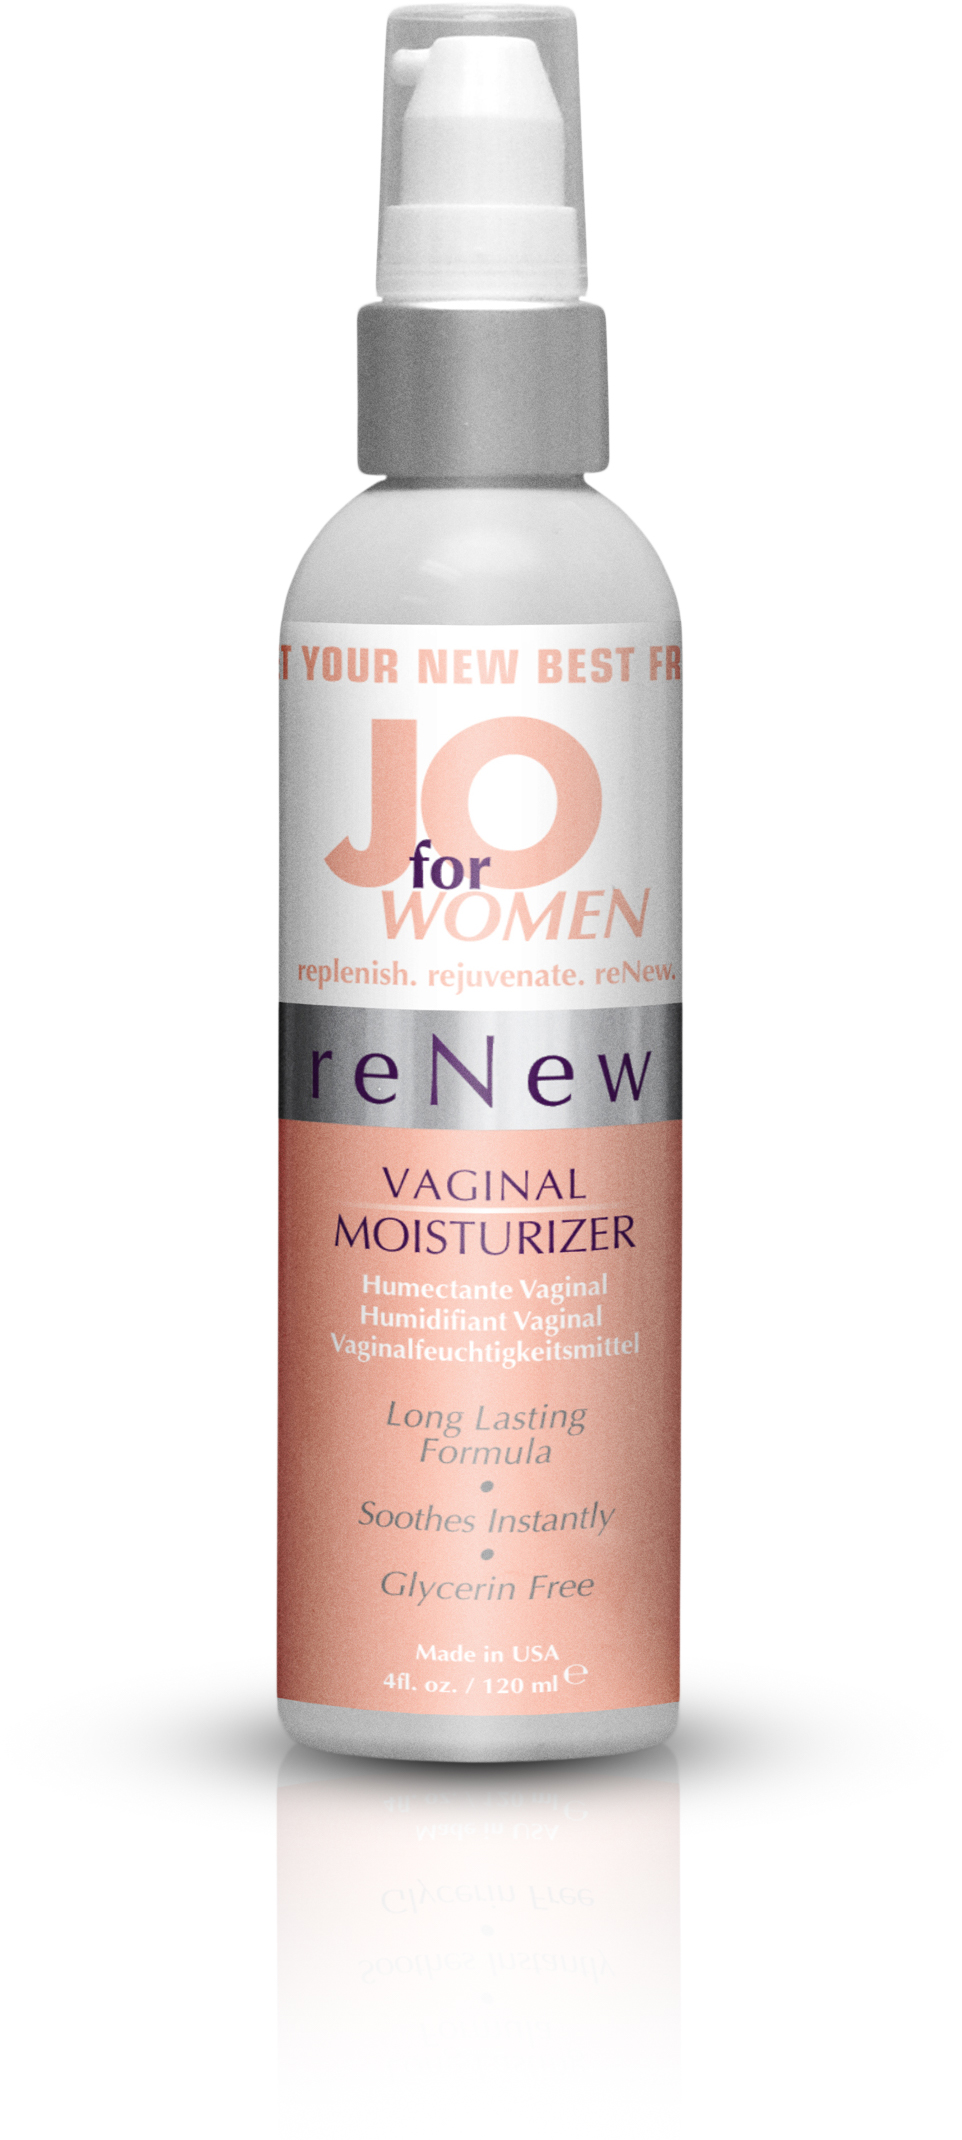 40228_JO_vaginal_renew_moisturizer_4oz.jpg